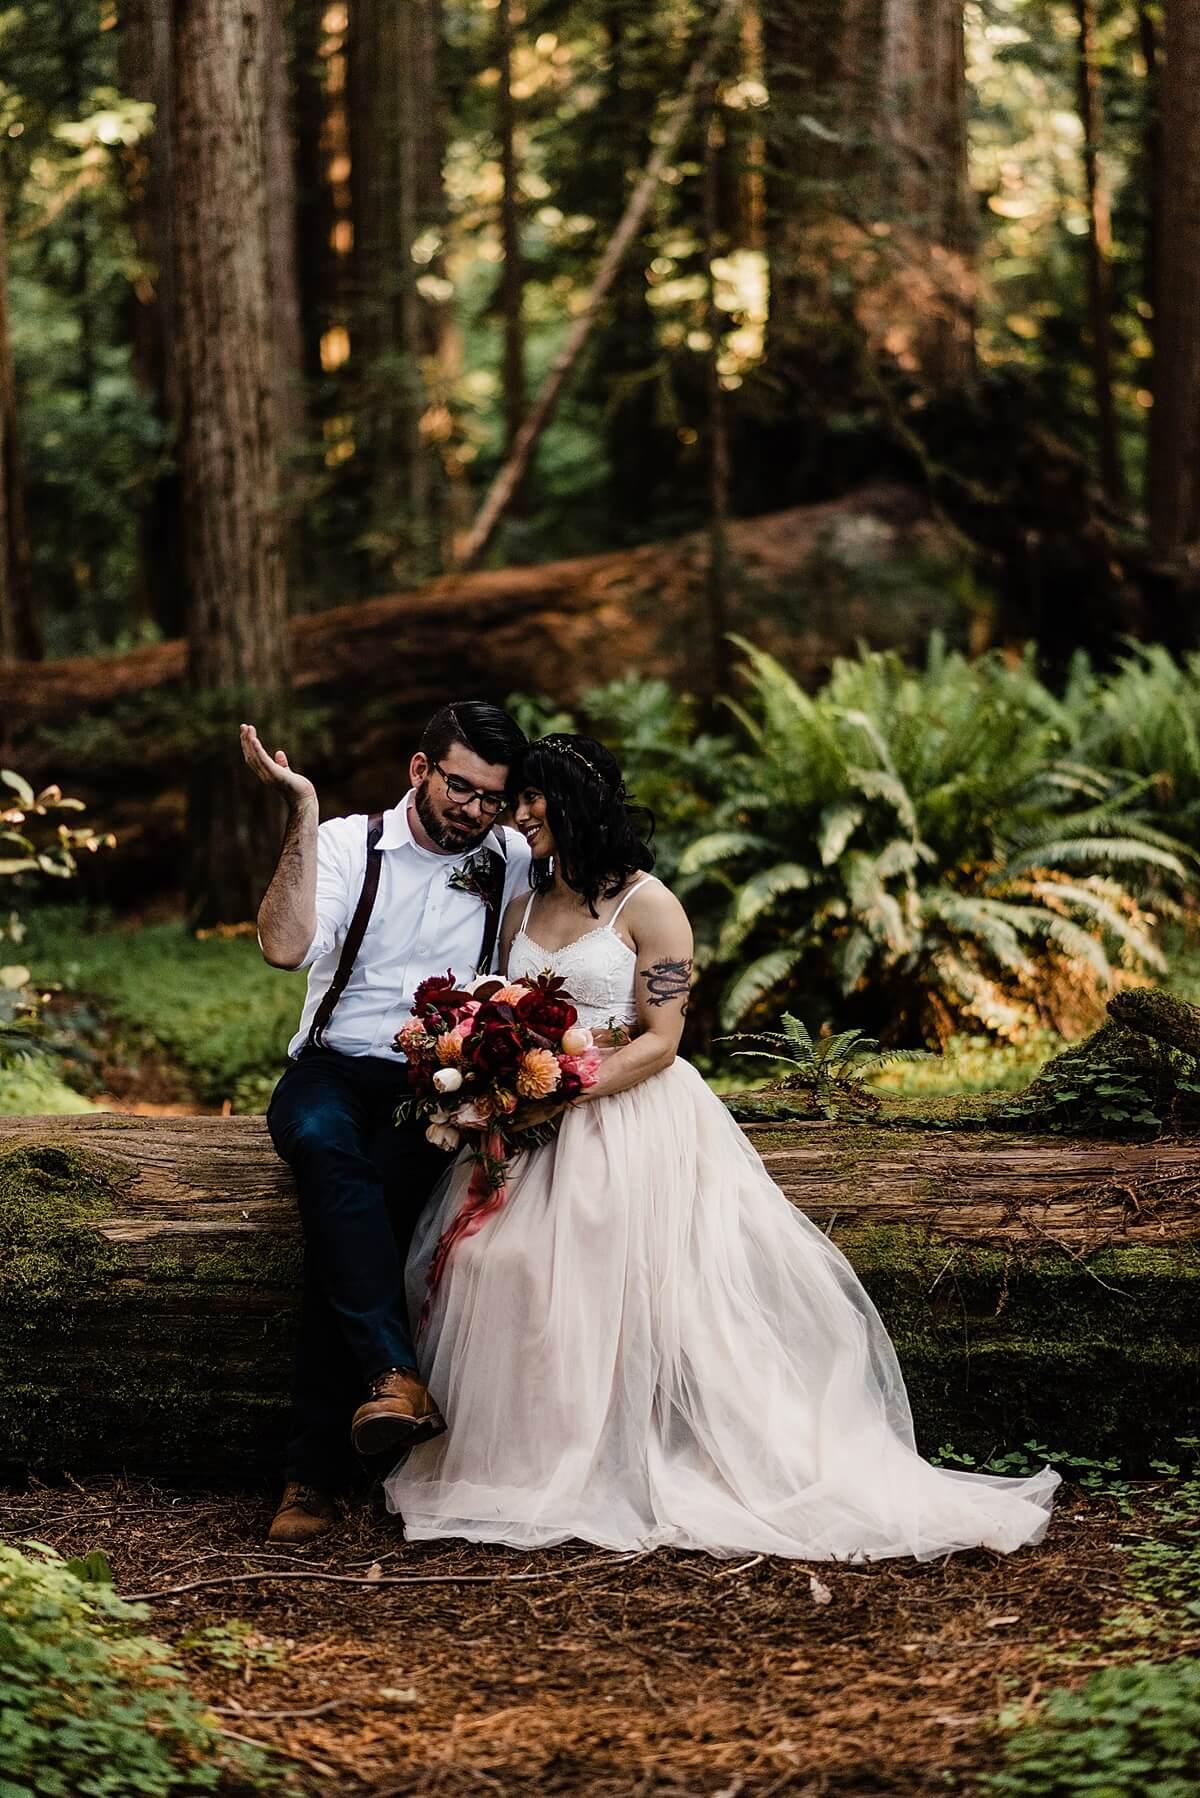 Allison-Brooks-Jedediah-Smiith-Redwoods-Adventure-Elopement-Wedding-S-Photography-Blog_0045.jpg